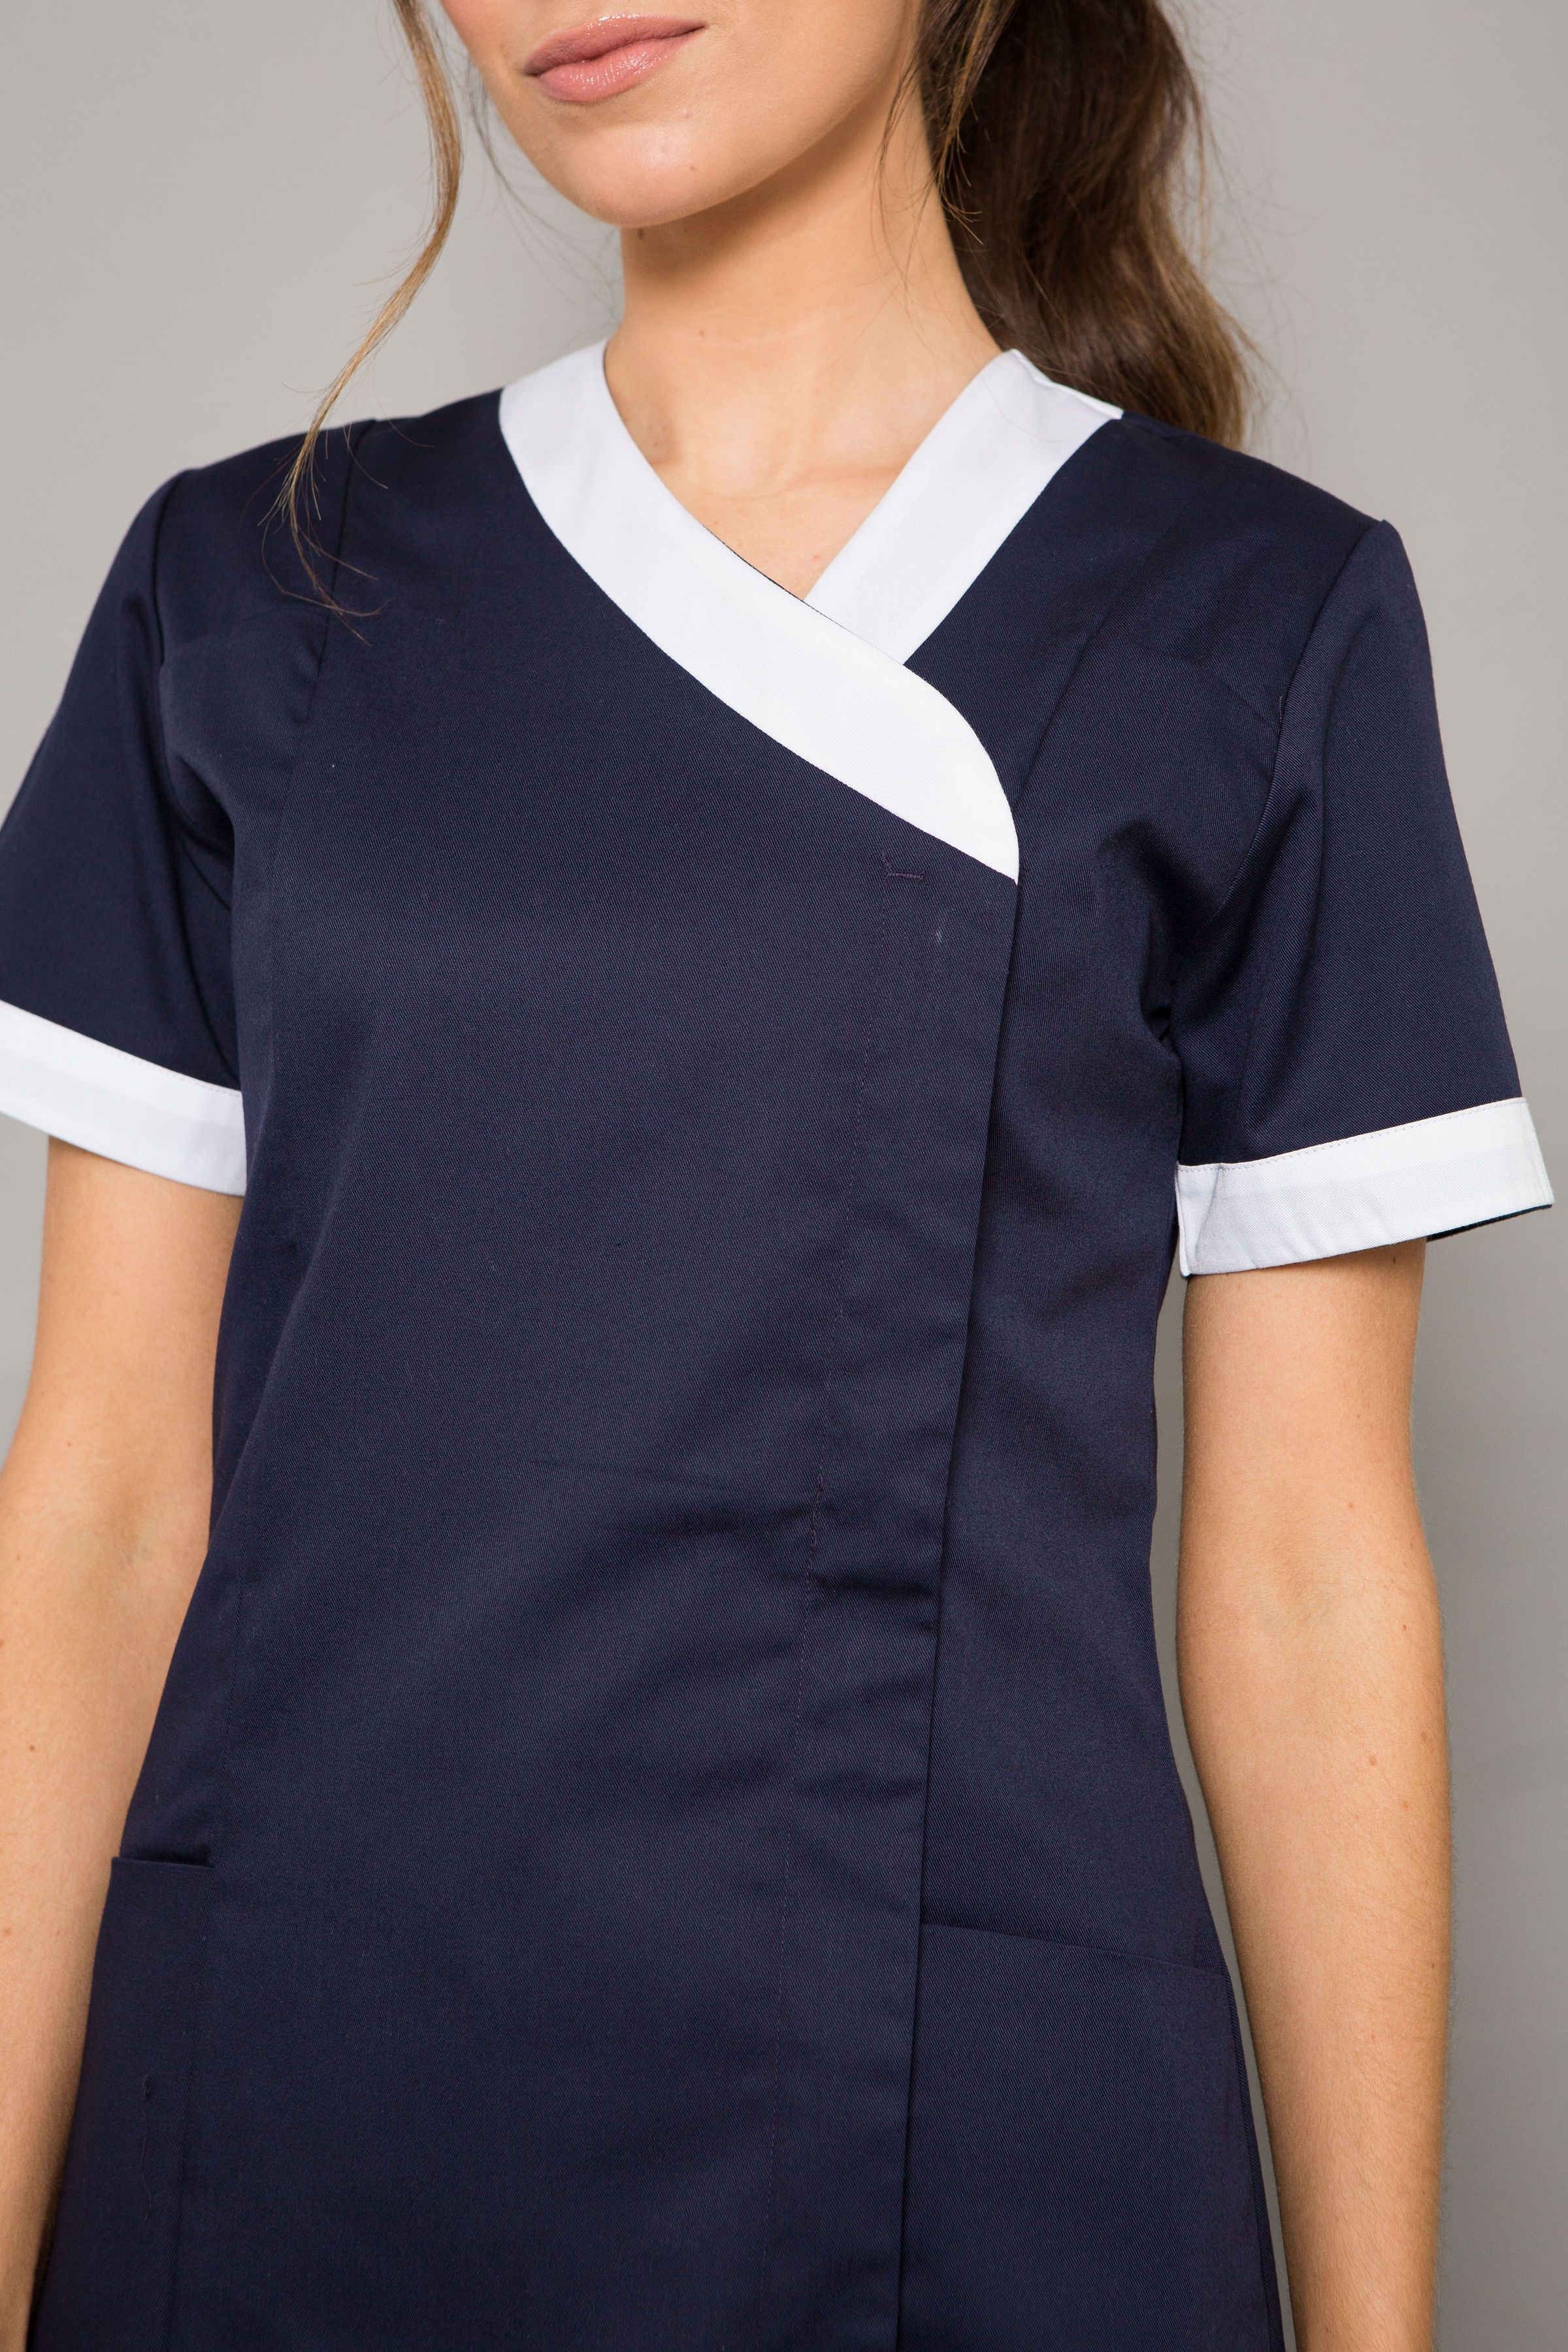 Mercia Asymmetric Modern Healthcare Tunic In 2020 Tunic Designs Beauty Uniforms Tunic